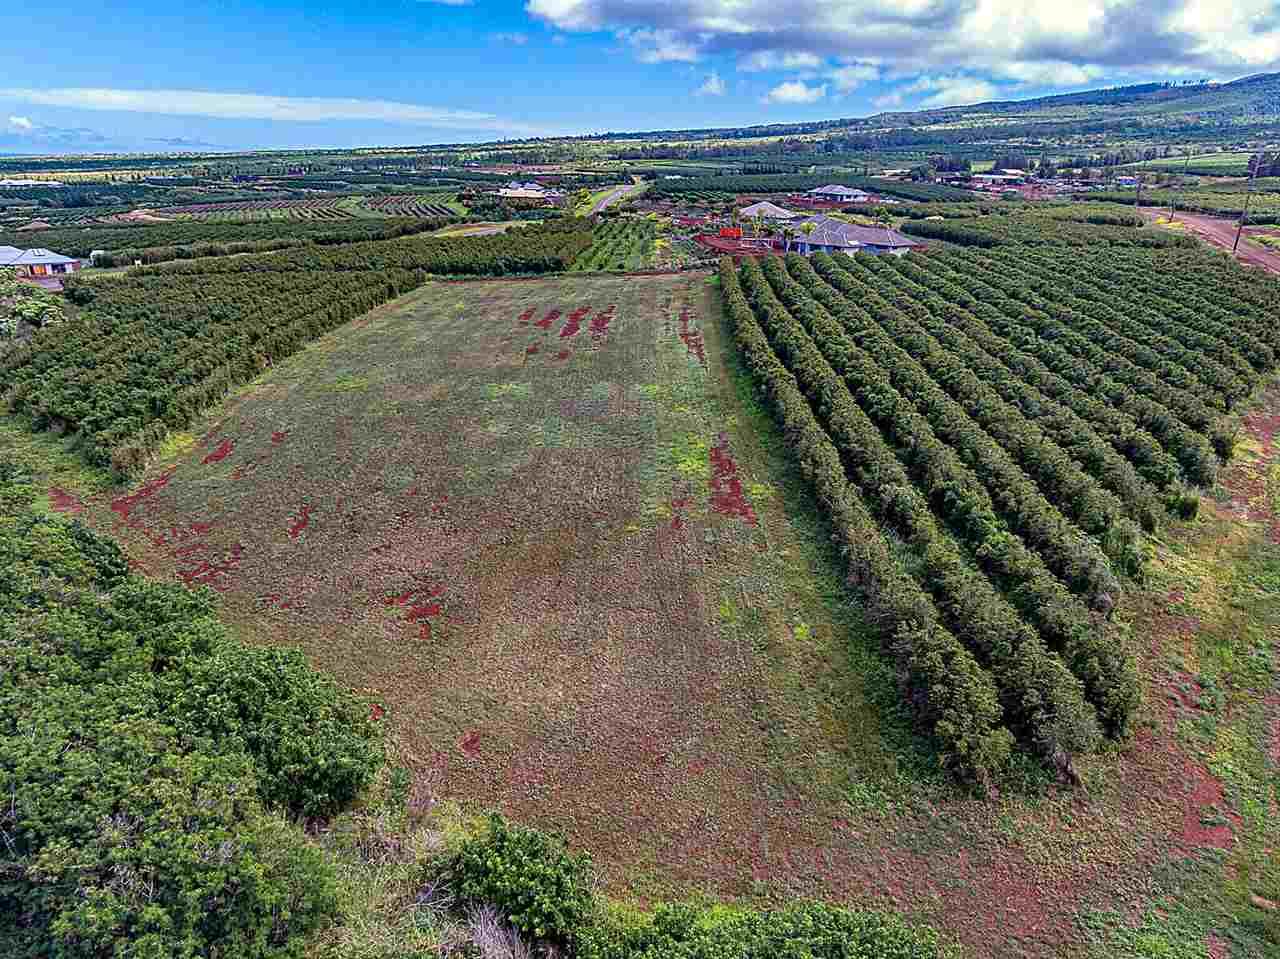 100 Aina Mahiai St Lahaina, Hi 96761 vacant land - photo 6 of 6